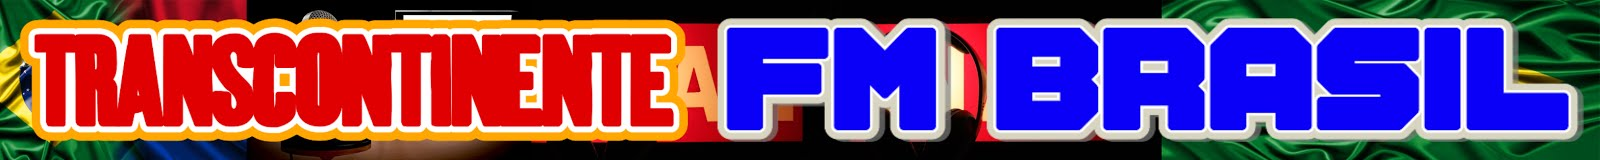 TRANSCONTINENTE FM BRASIL